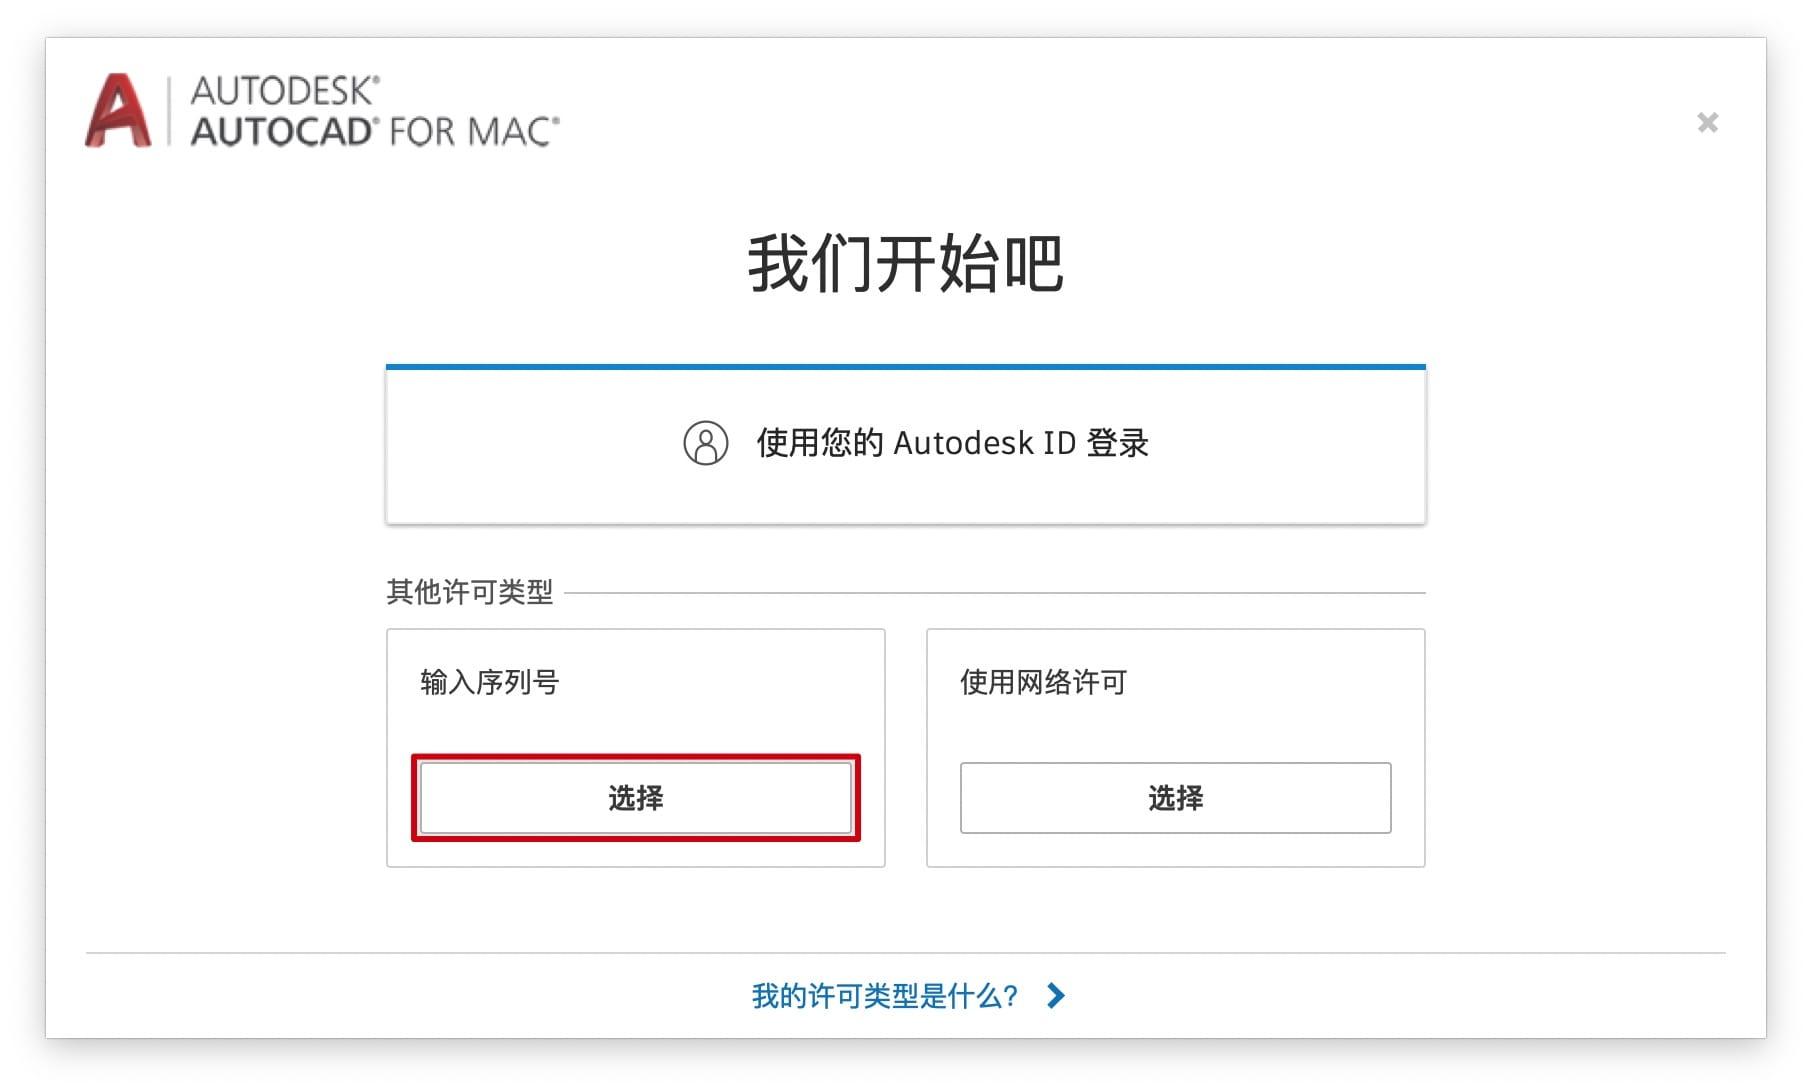 AutoCAD 2021.1 for Mac 中文版破解教程(支持Big Sur) Mac教程 第6张